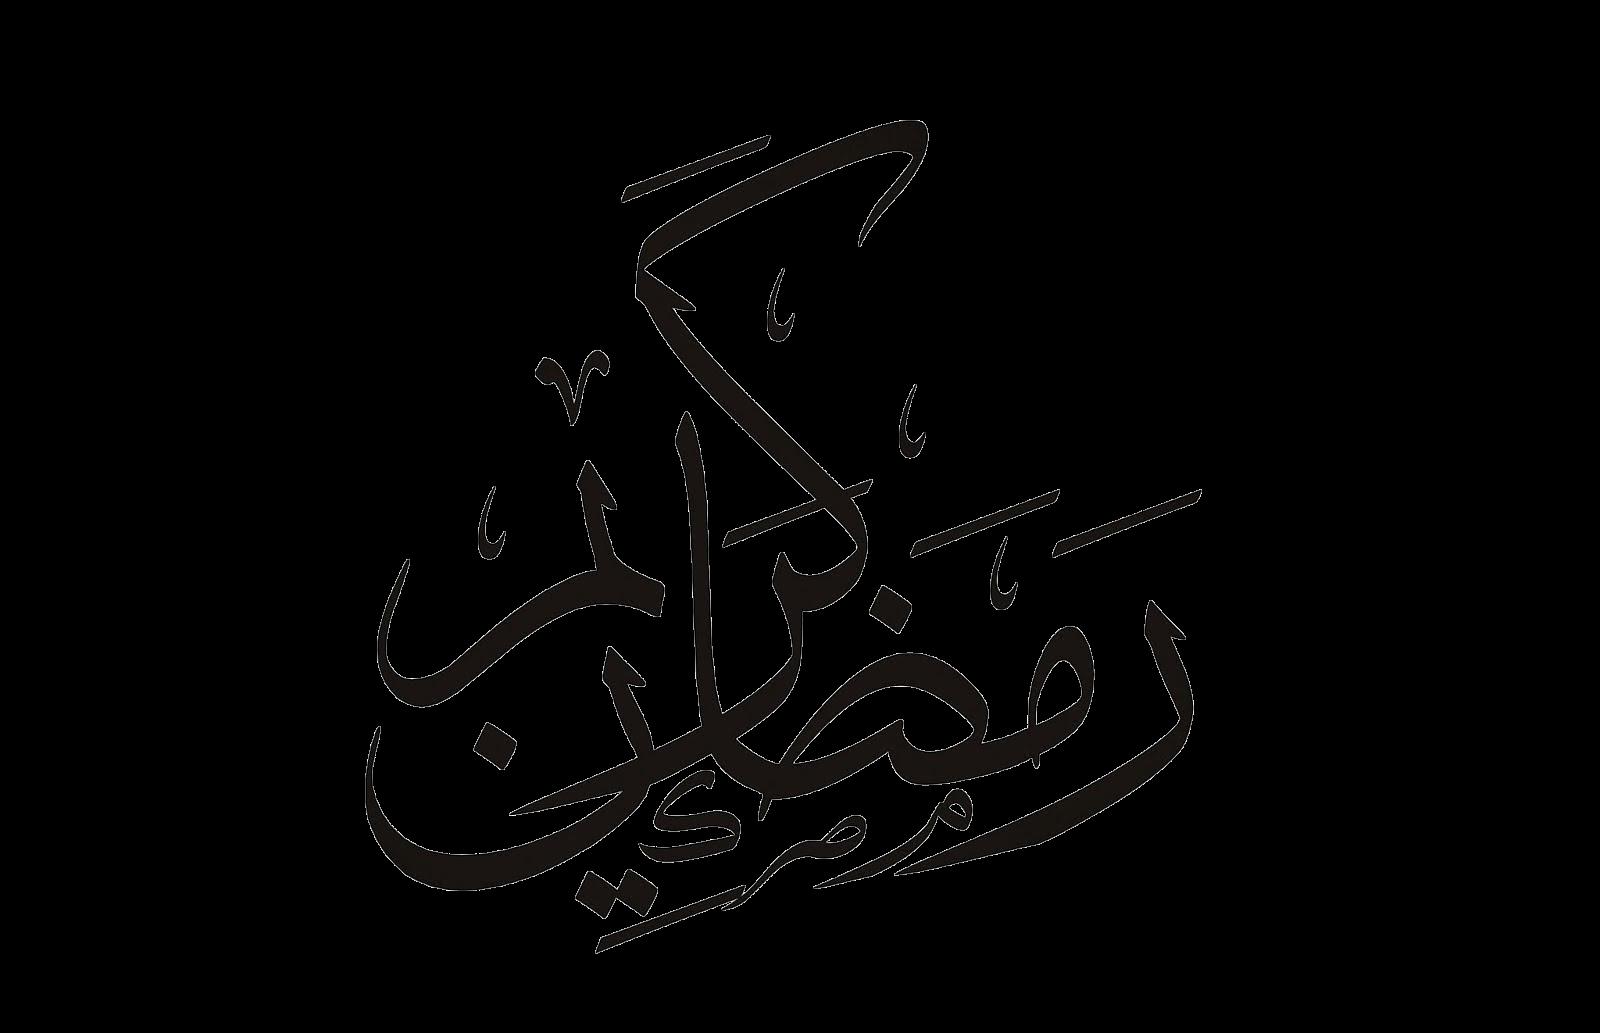 IONA Ramadan Announcement   My Shehar   Shehar means city for Ramadan Kareem Transparent  51ane